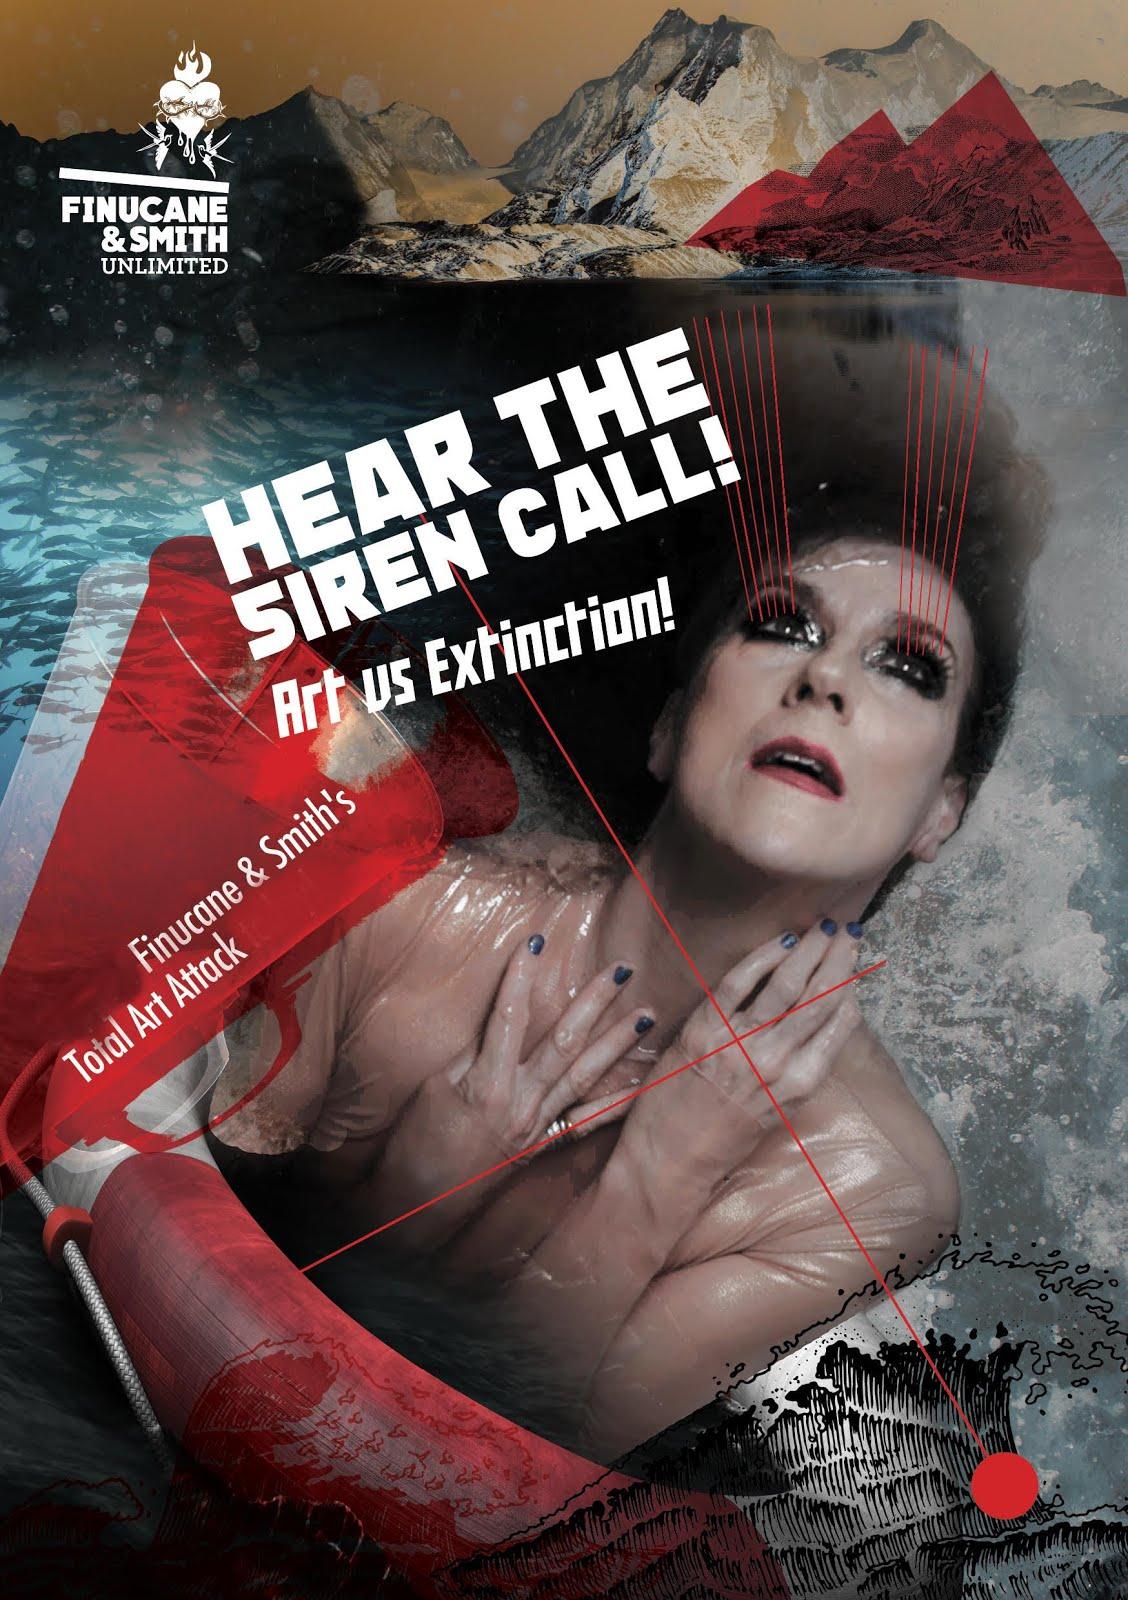 HEAR THE SIREN CALL! - Wierd, gothic, submerged...